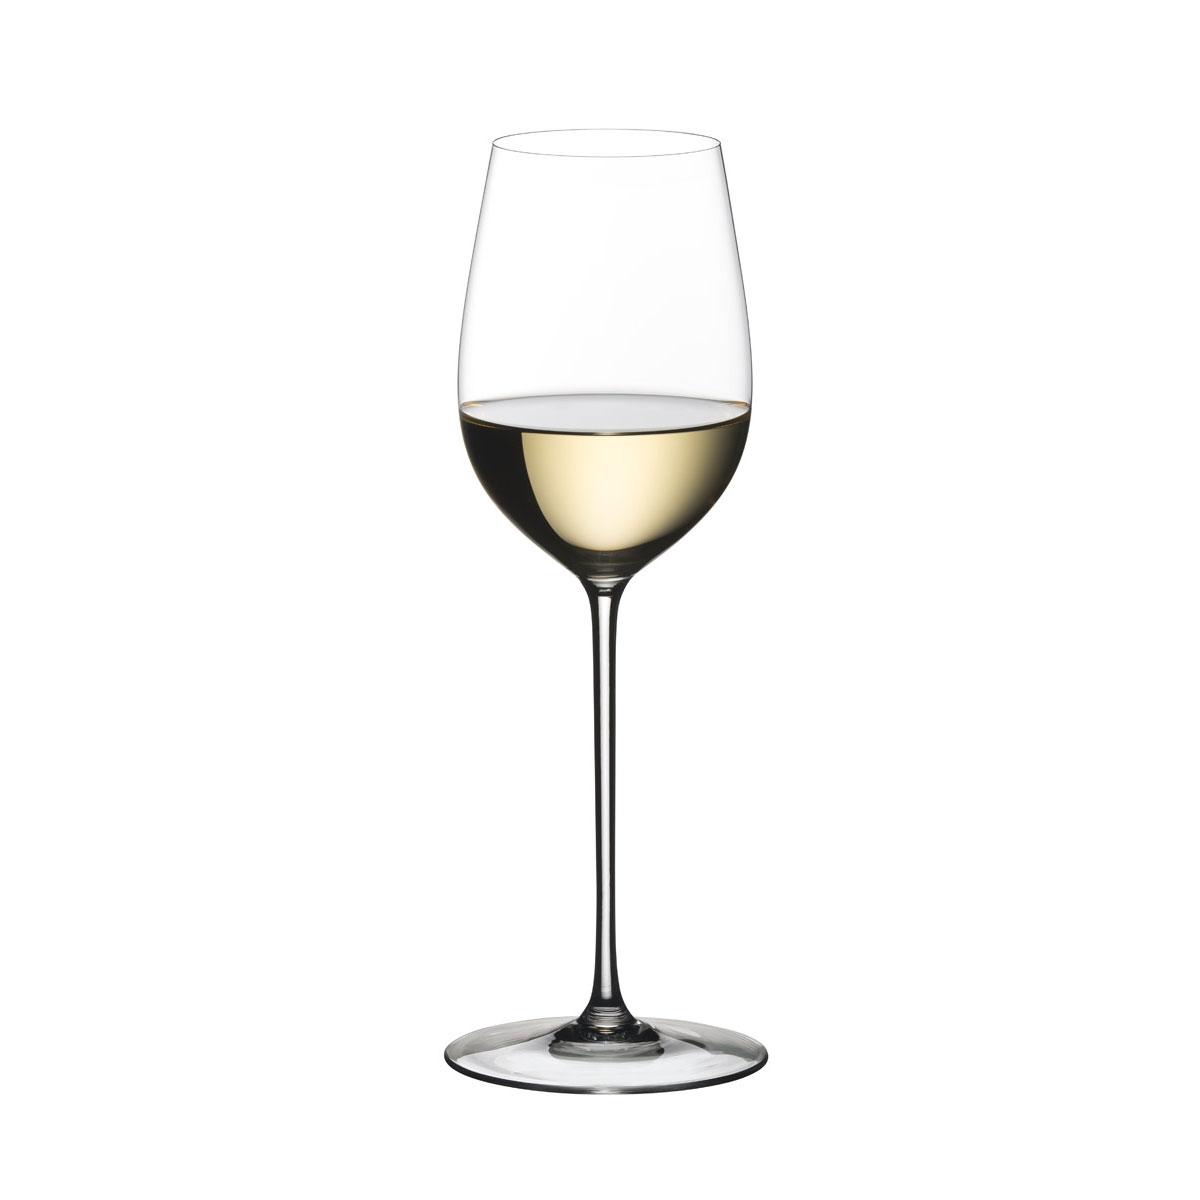 Riedel Sommeliers, Hand Made, Superleggero Viognier, Chardonnay, Single